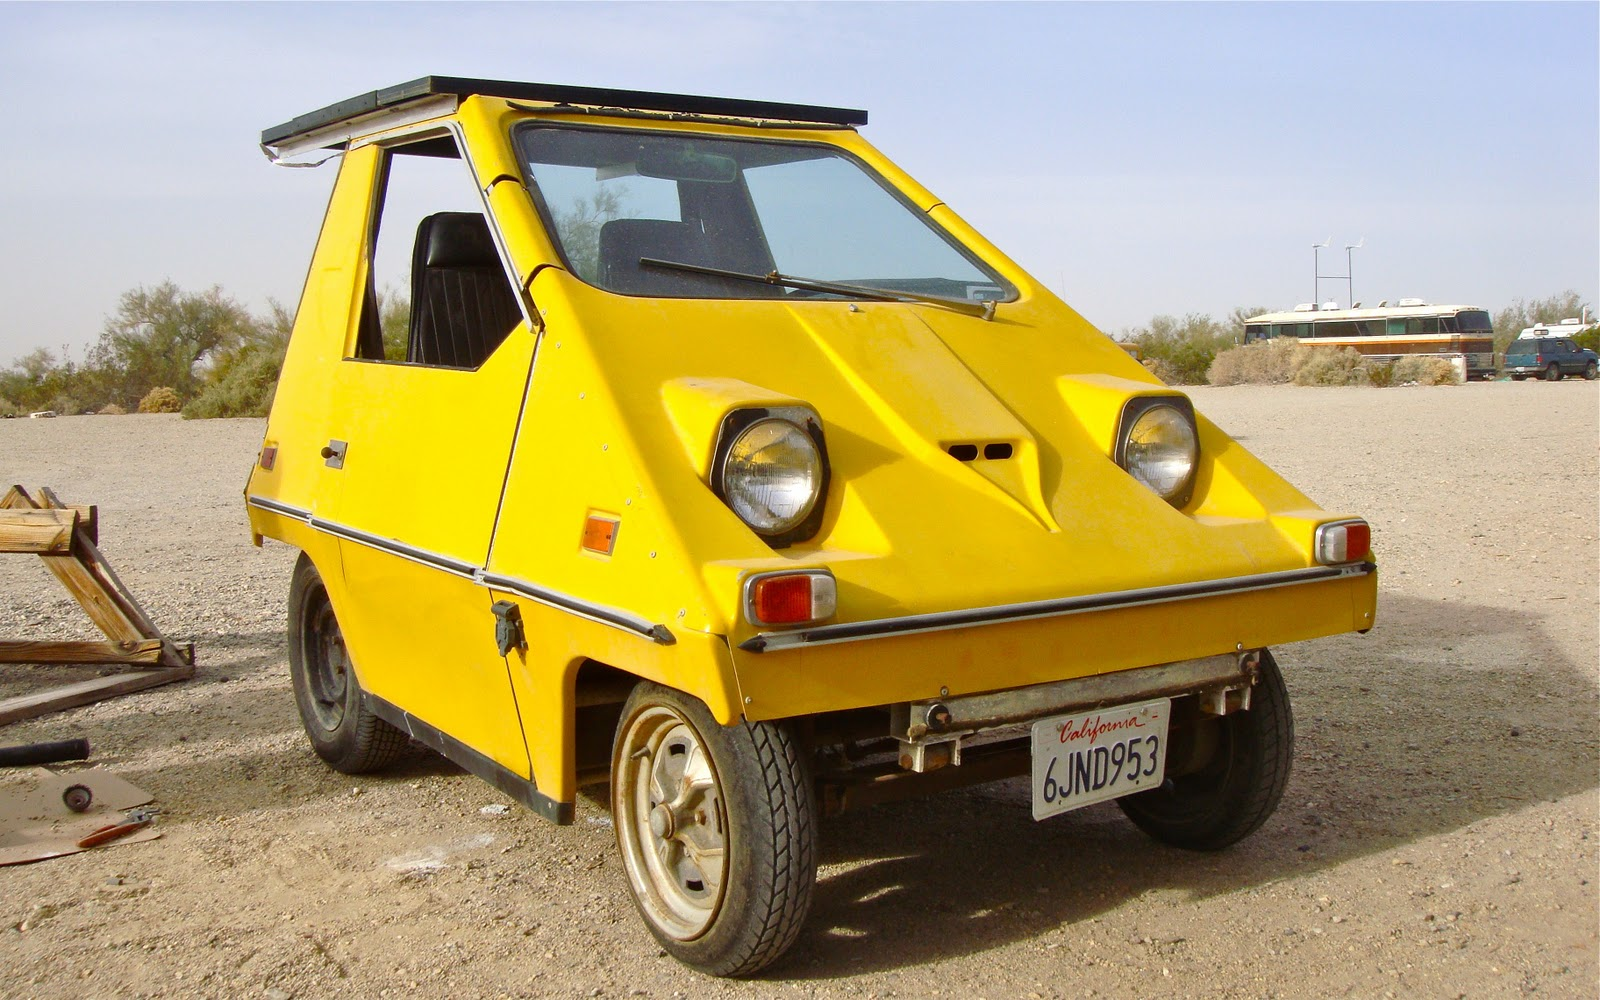 Citi Bank Car Load